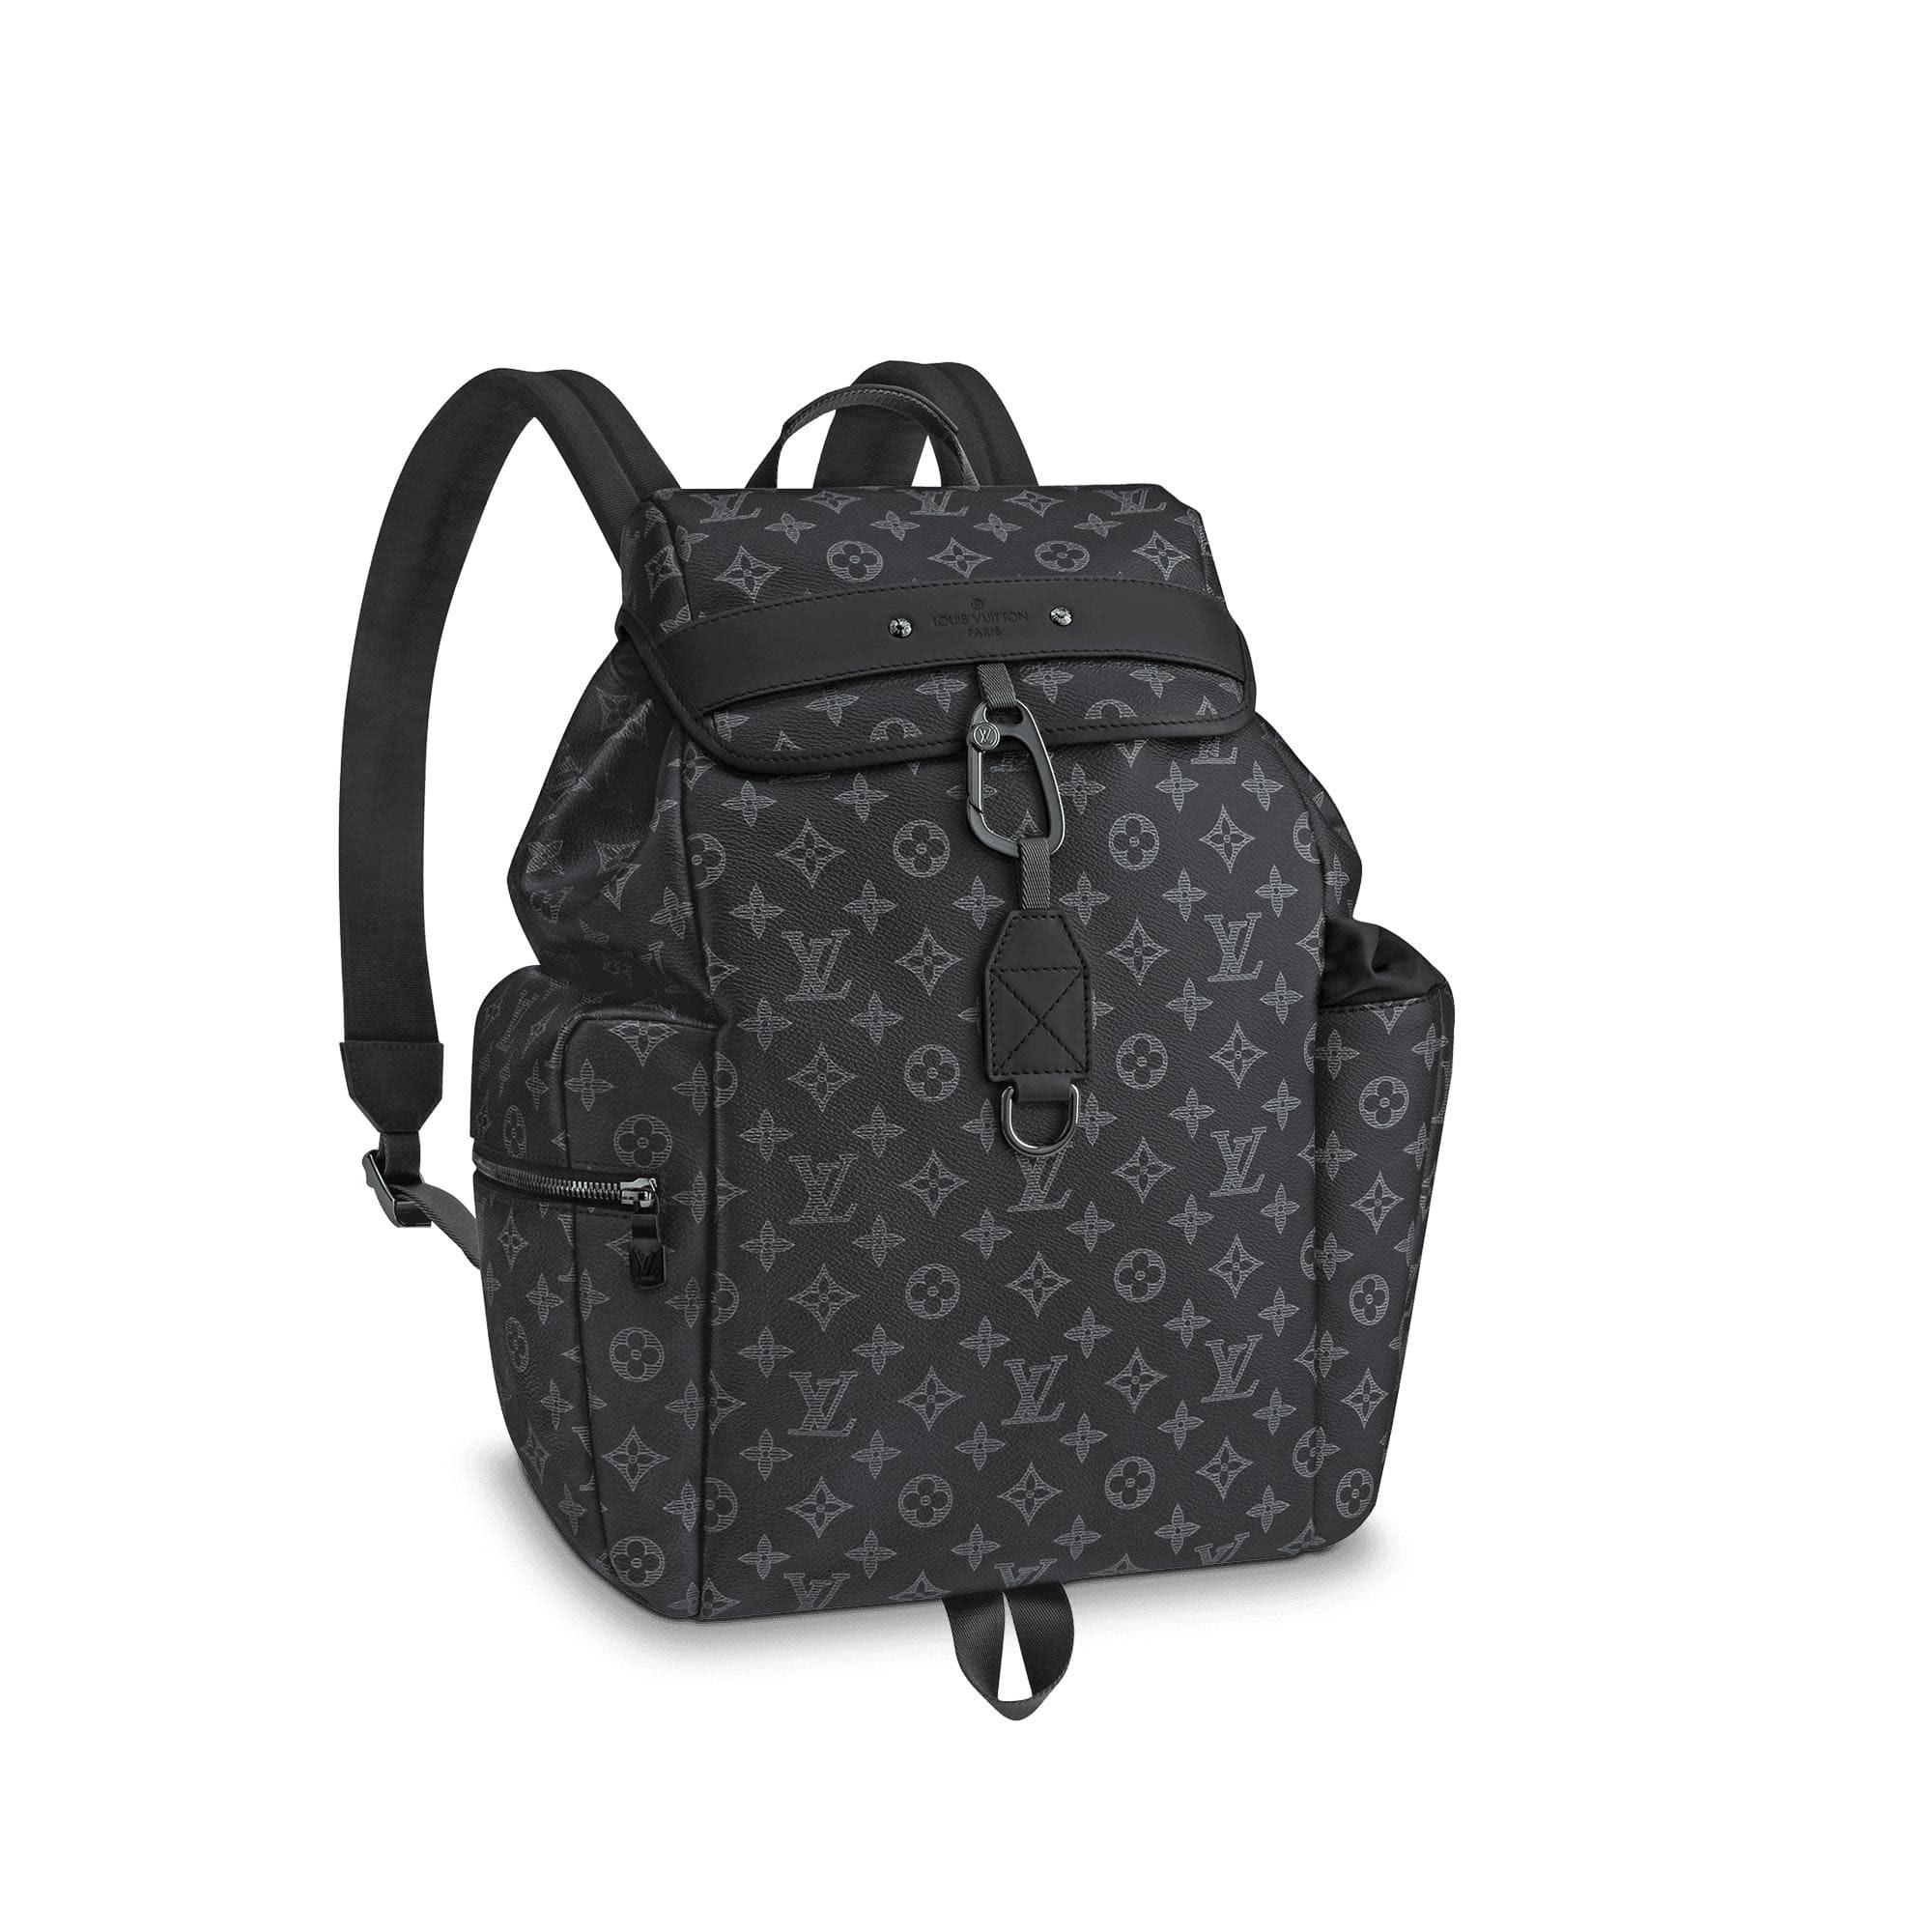 Louis Vuitton Discovery Backpack Monogram Vivienne Eclipse Black